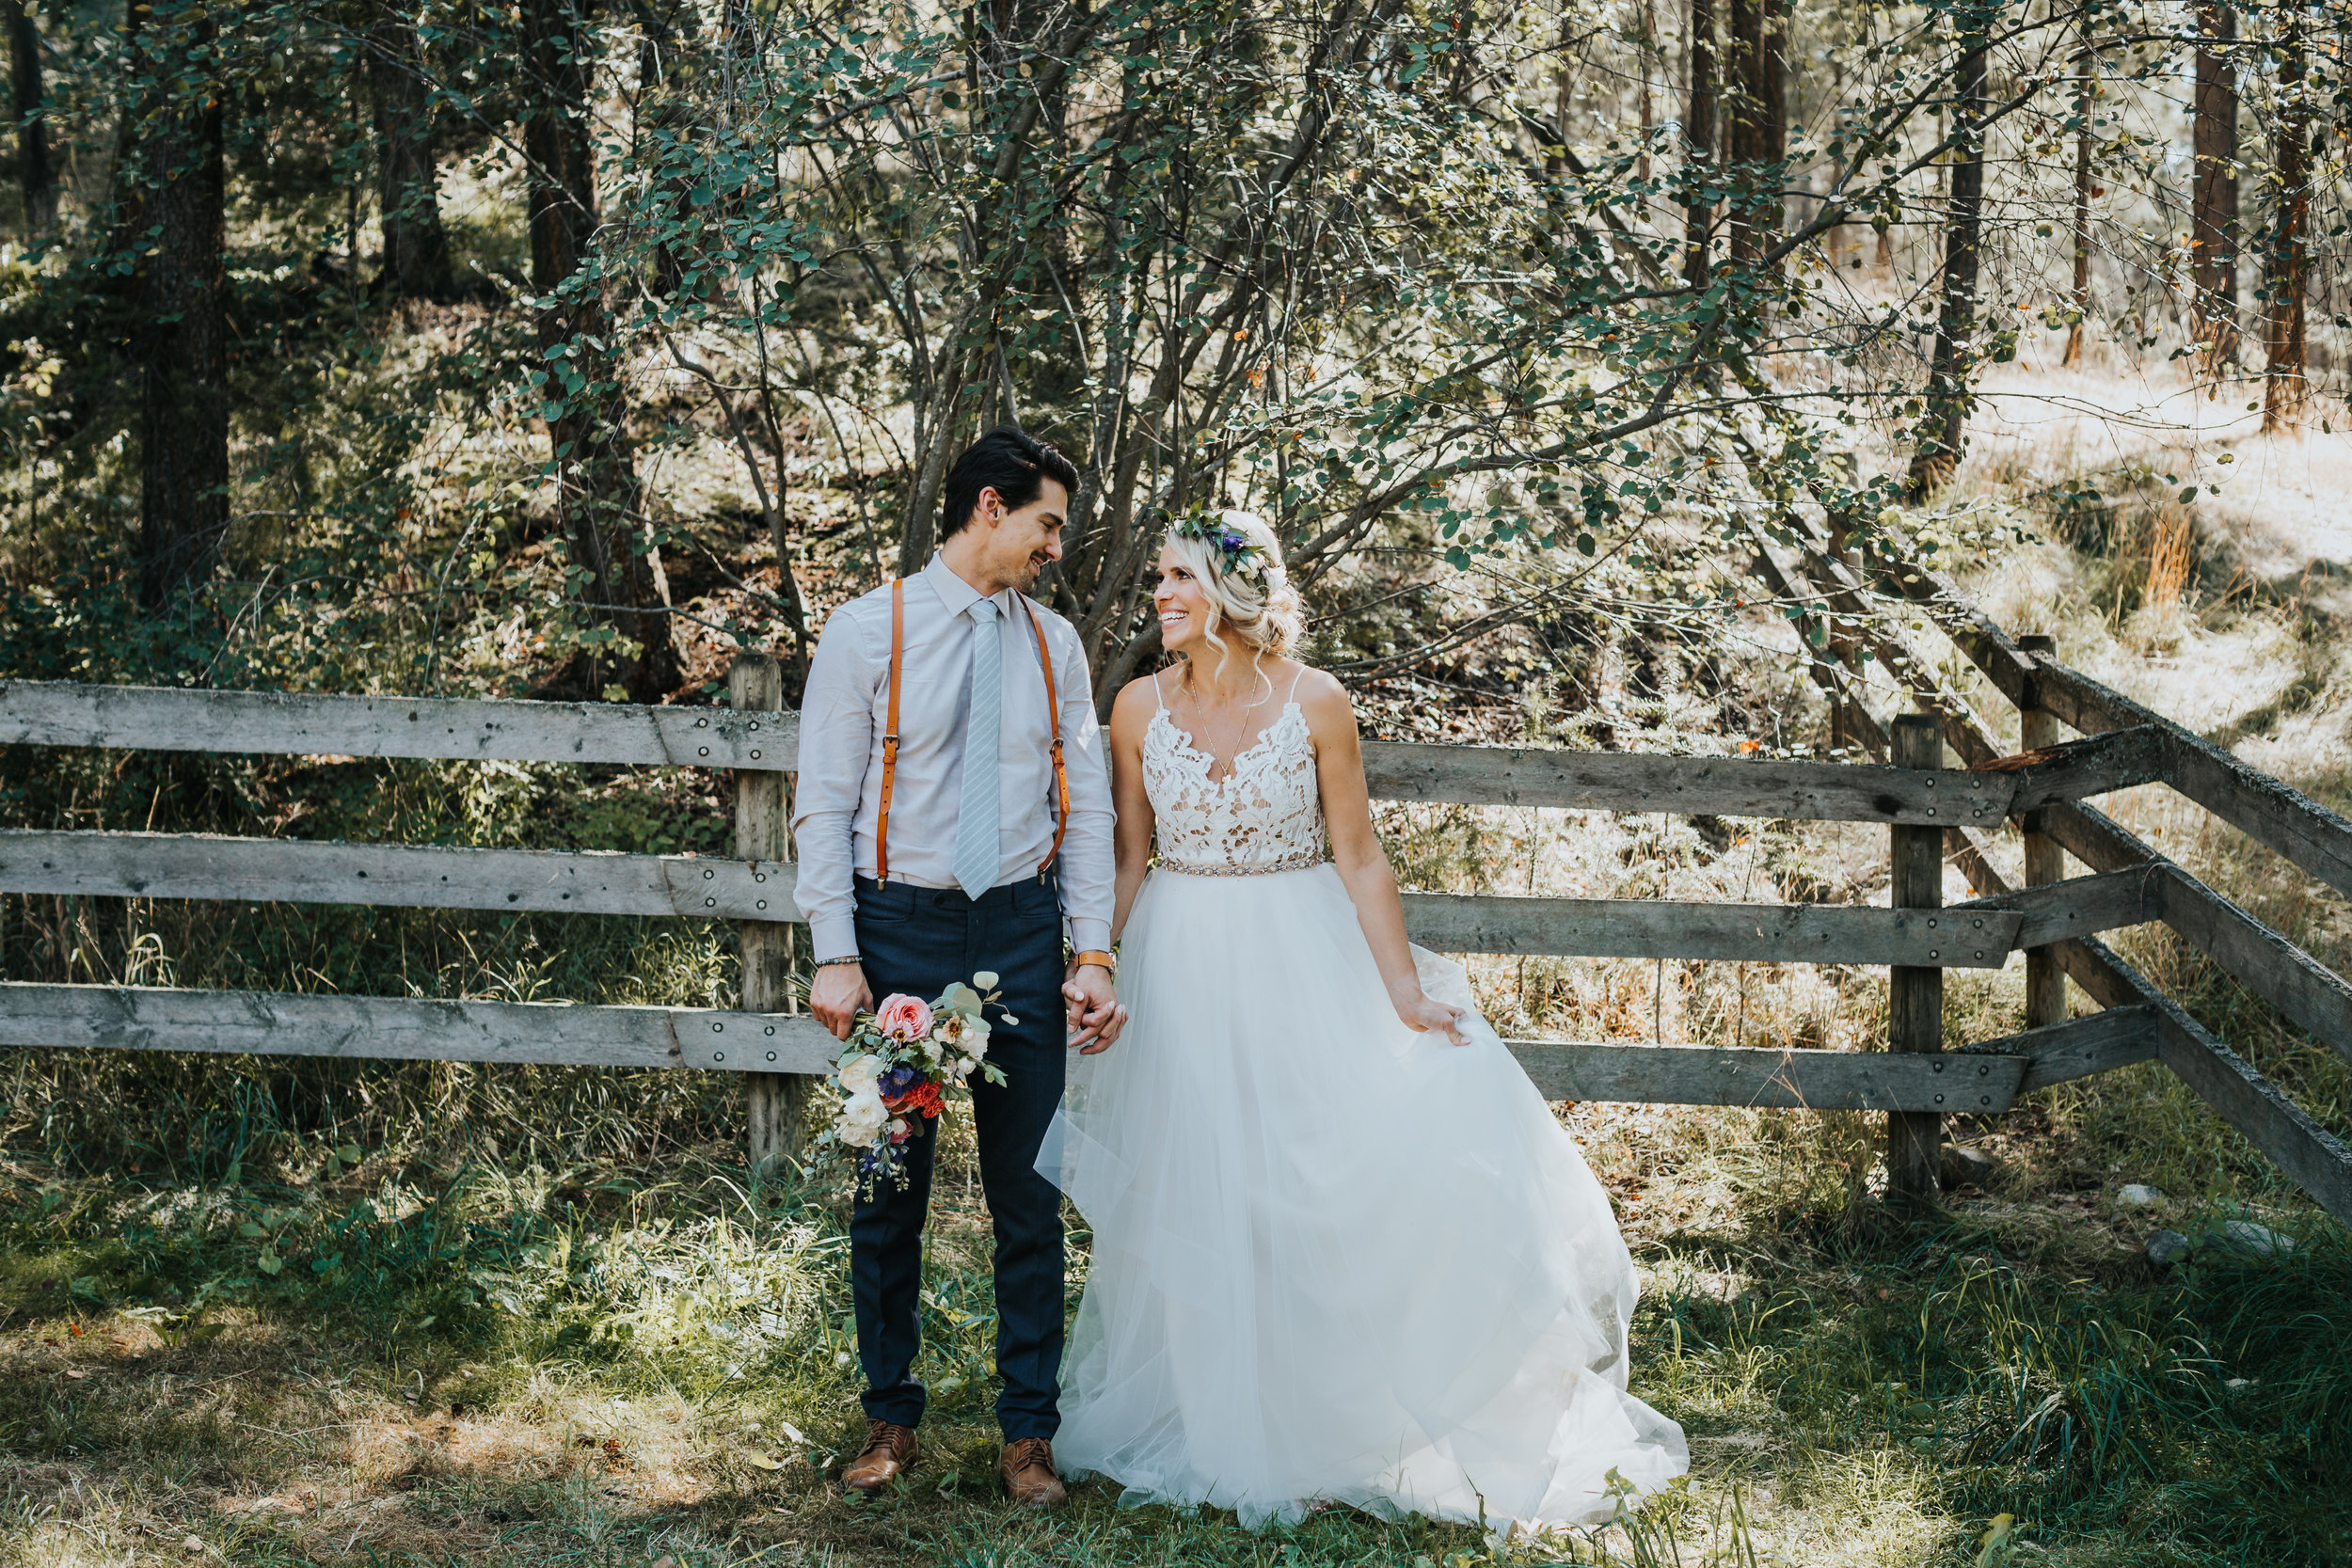 Aaron+Lindsey_Wedding3182.jpg